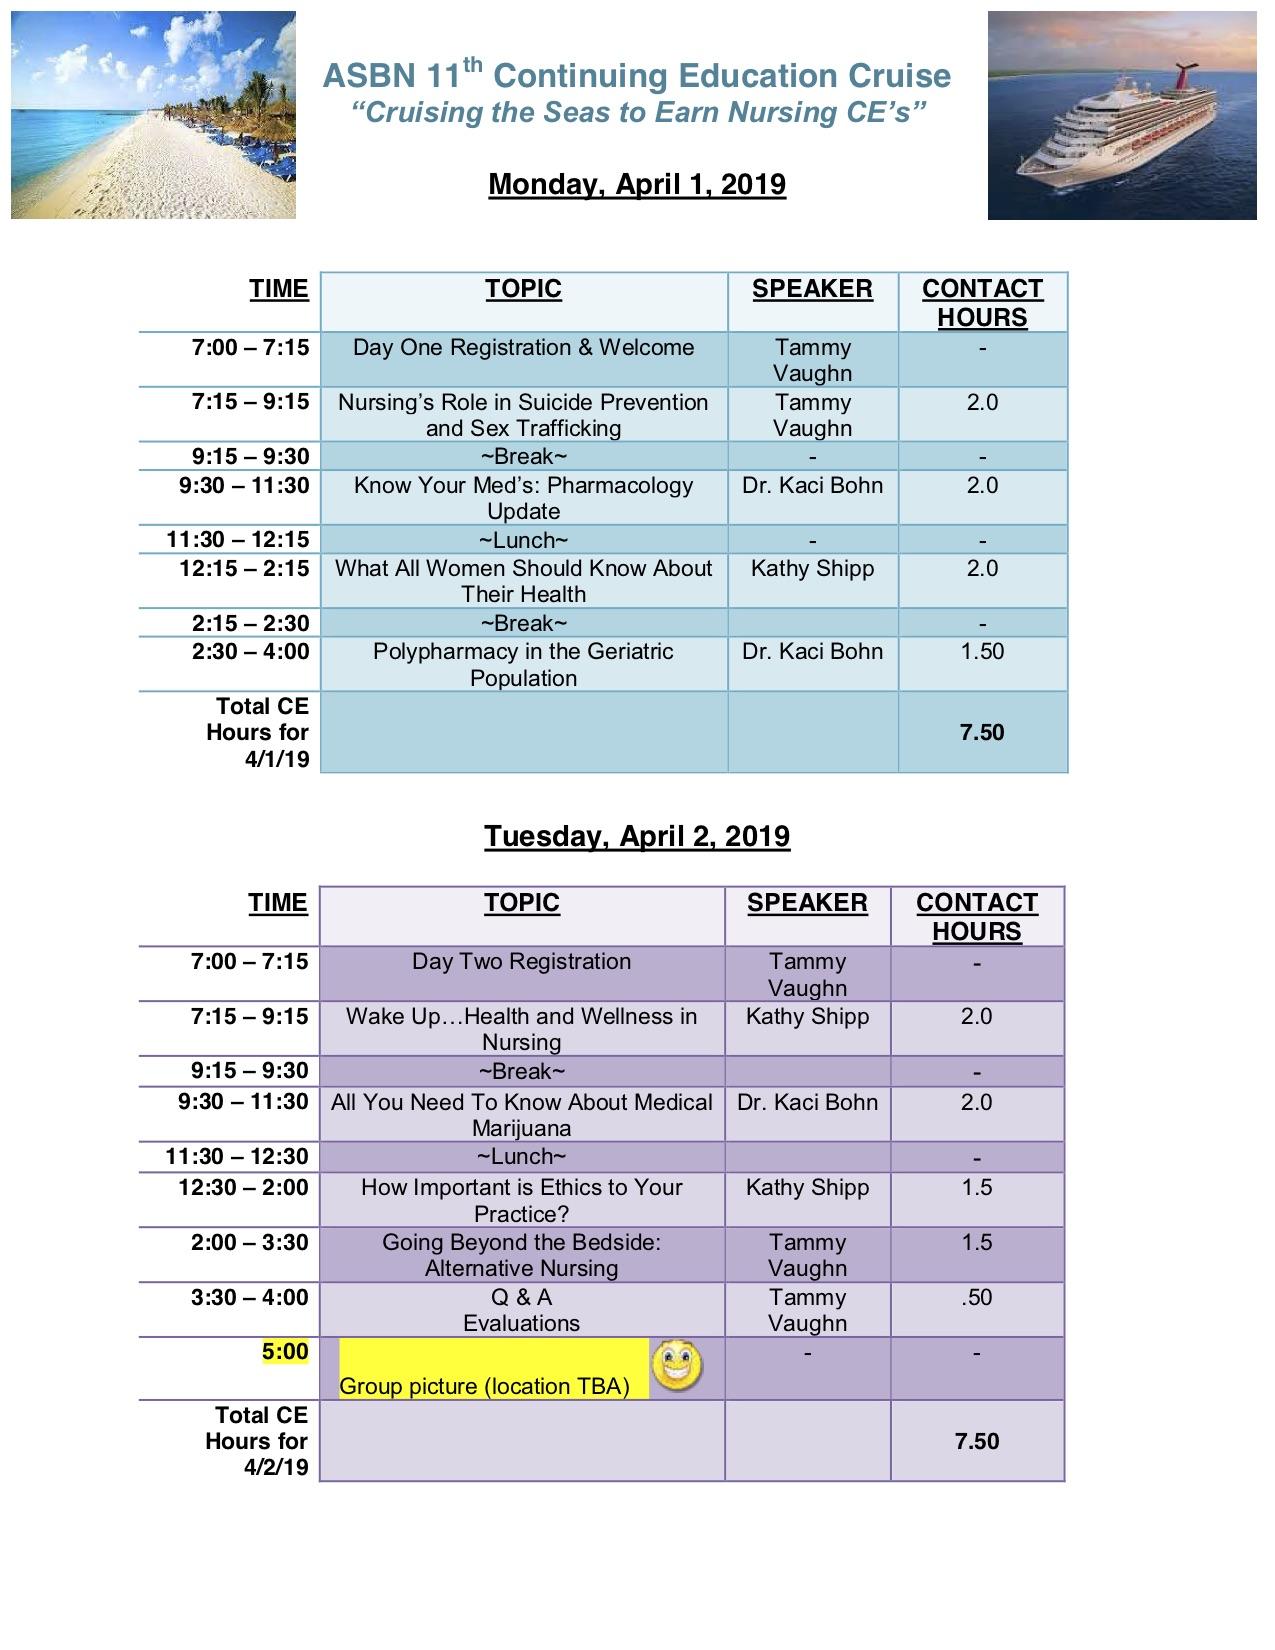 Cruise Itinerary-Revised May 2018.jpg